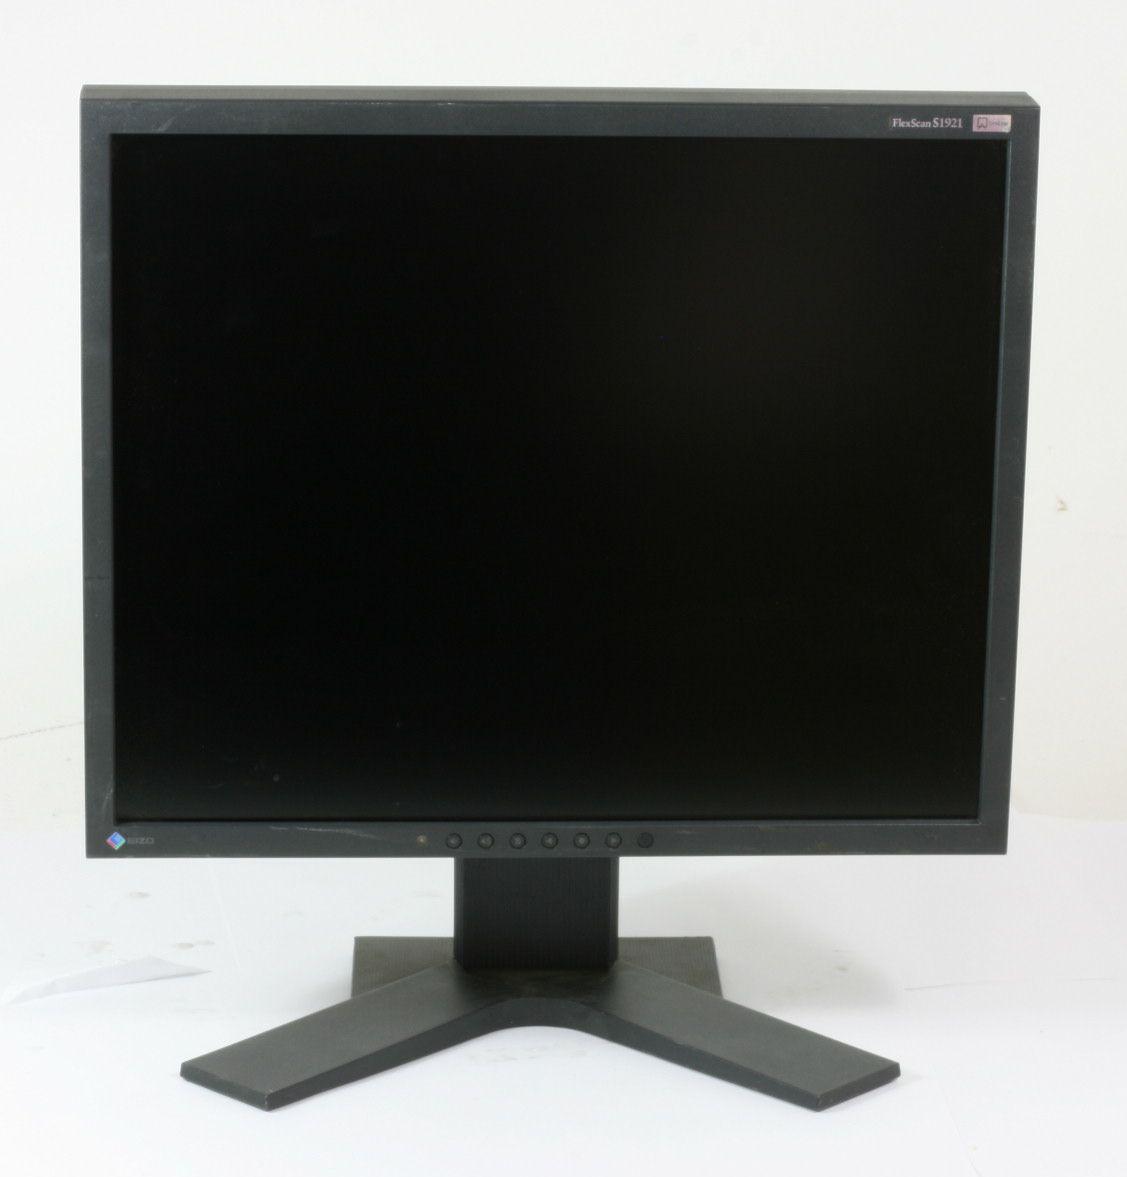 "EIZO Monitor 19 Zoll FlexScan S1921  TFT LCD-Display gebraucht 19"""